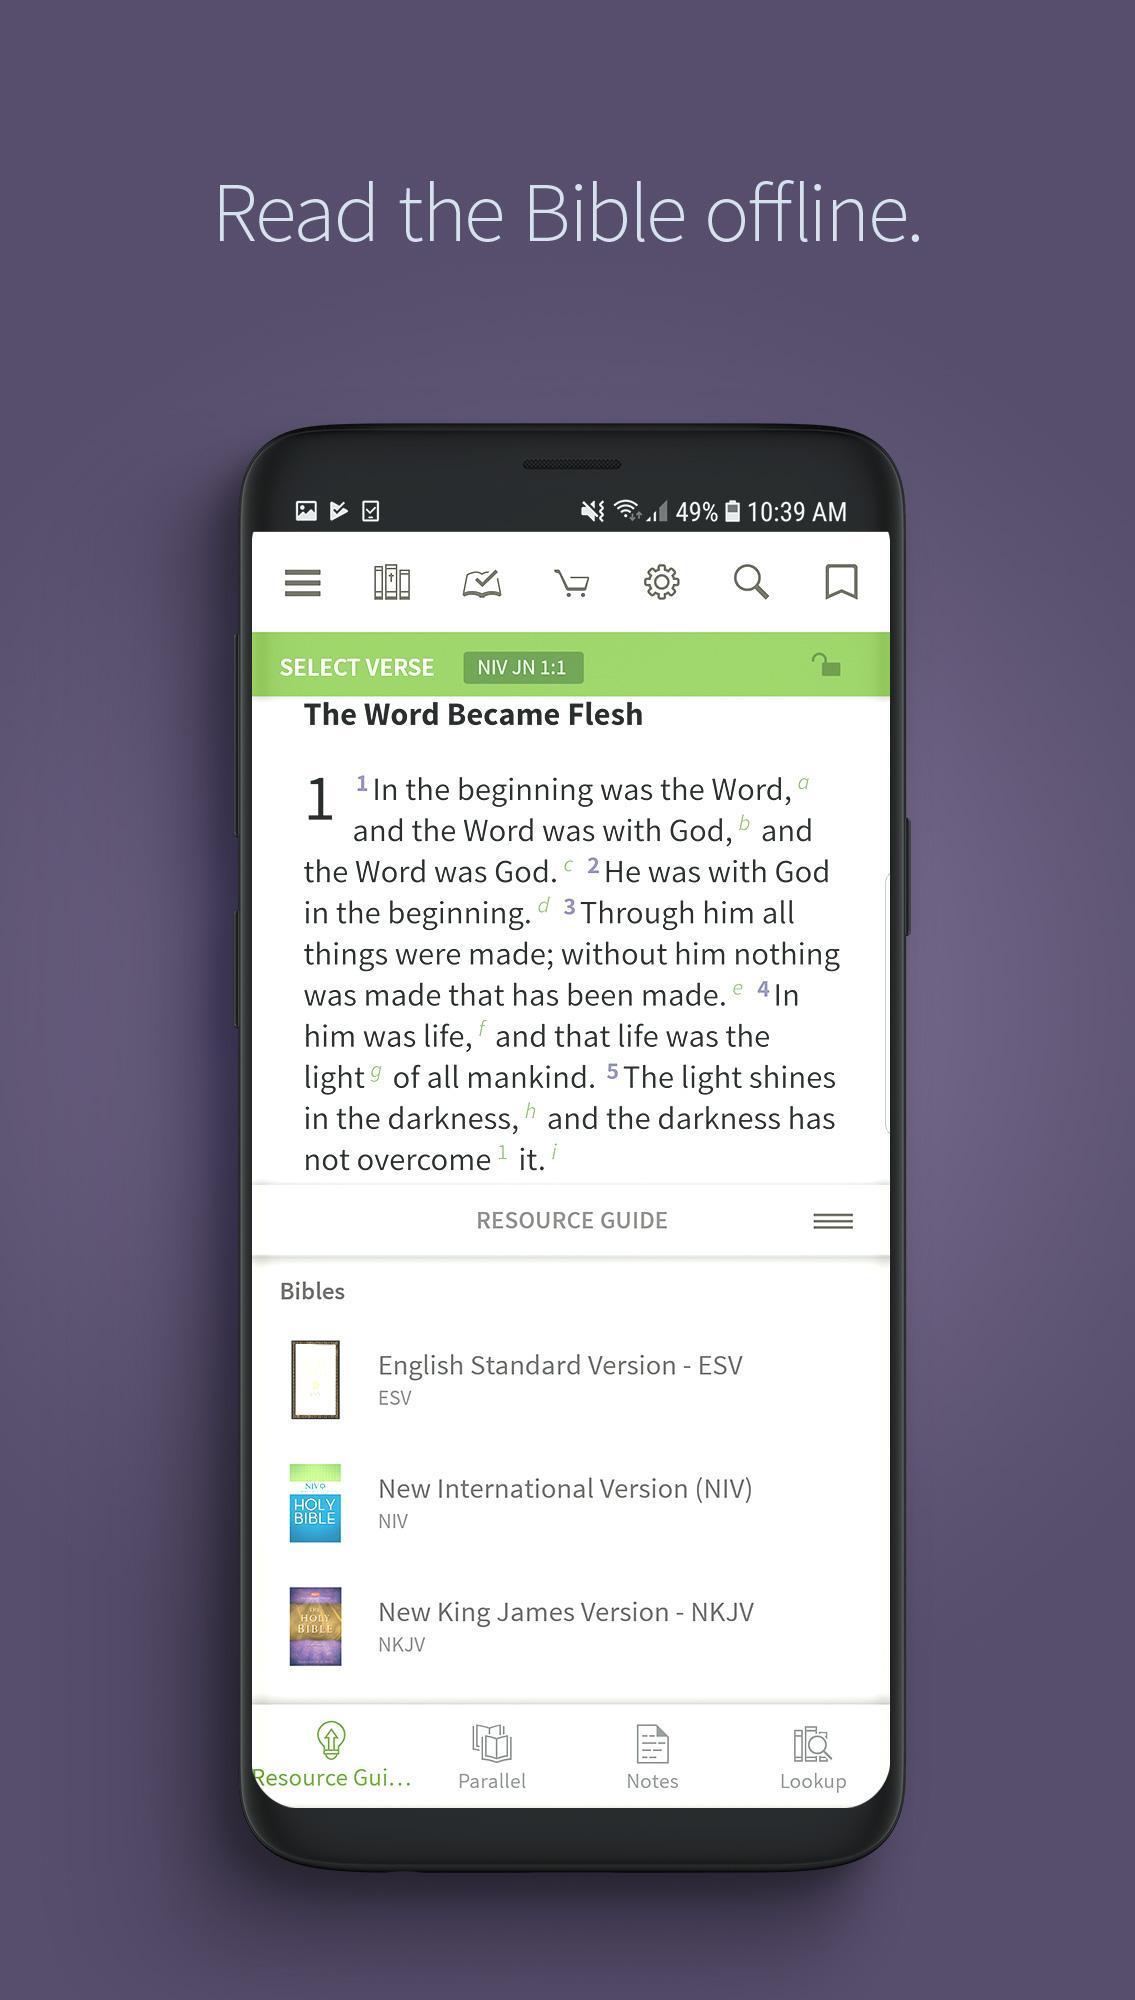 Bible App by Olive Tree 7.5.4.0.5664 Screenshot 1